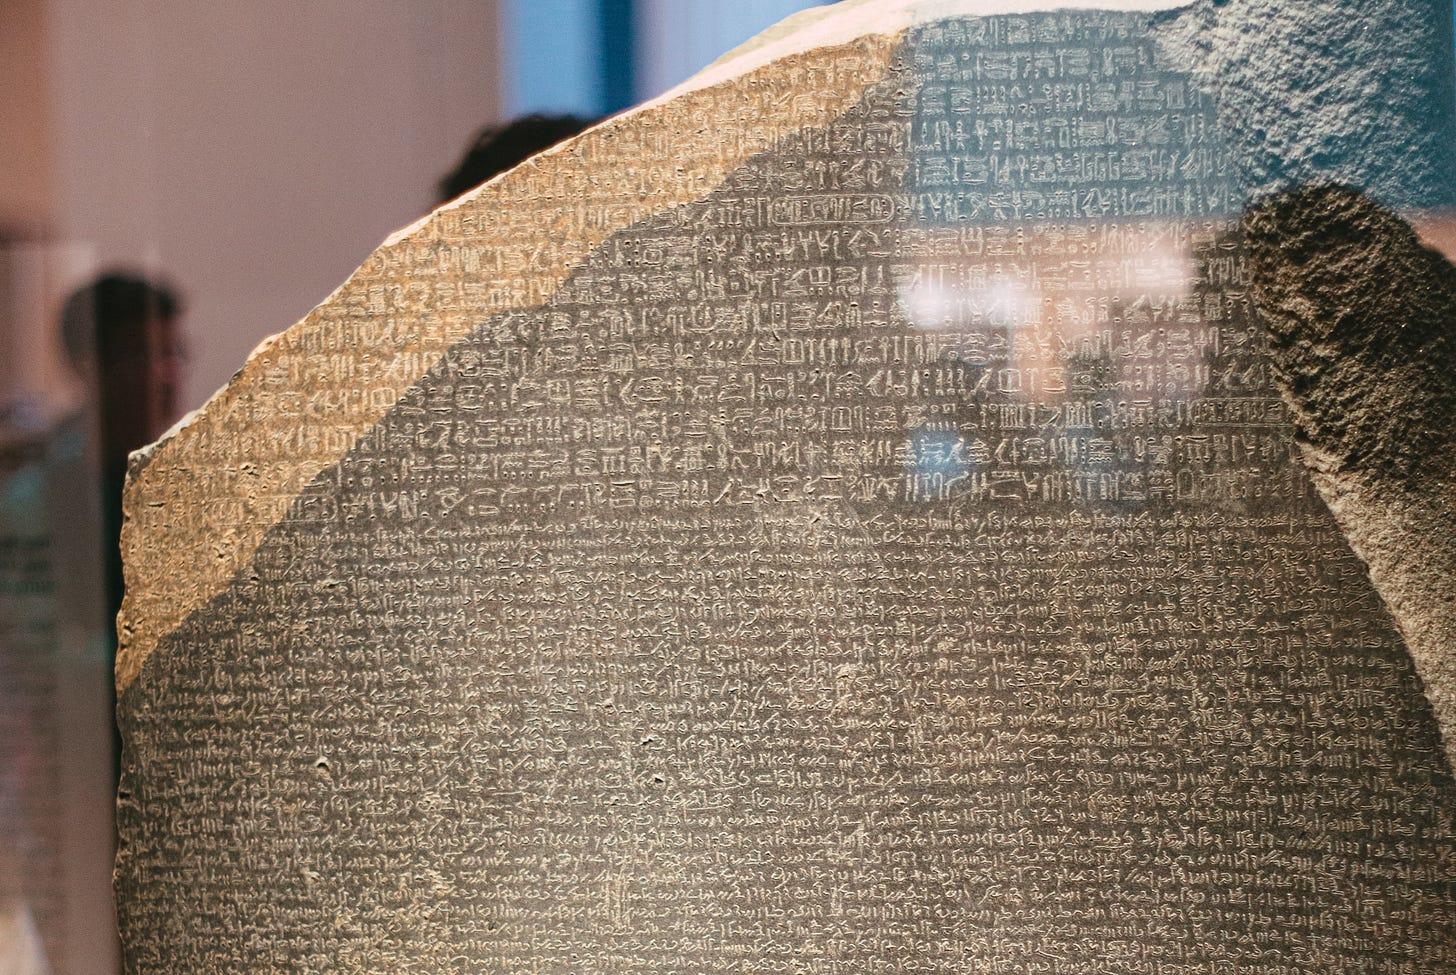 The Rosetta Stone (https://en.wikipedia.org/wiki/Rosetta_Stone) changed the course of linguistics.